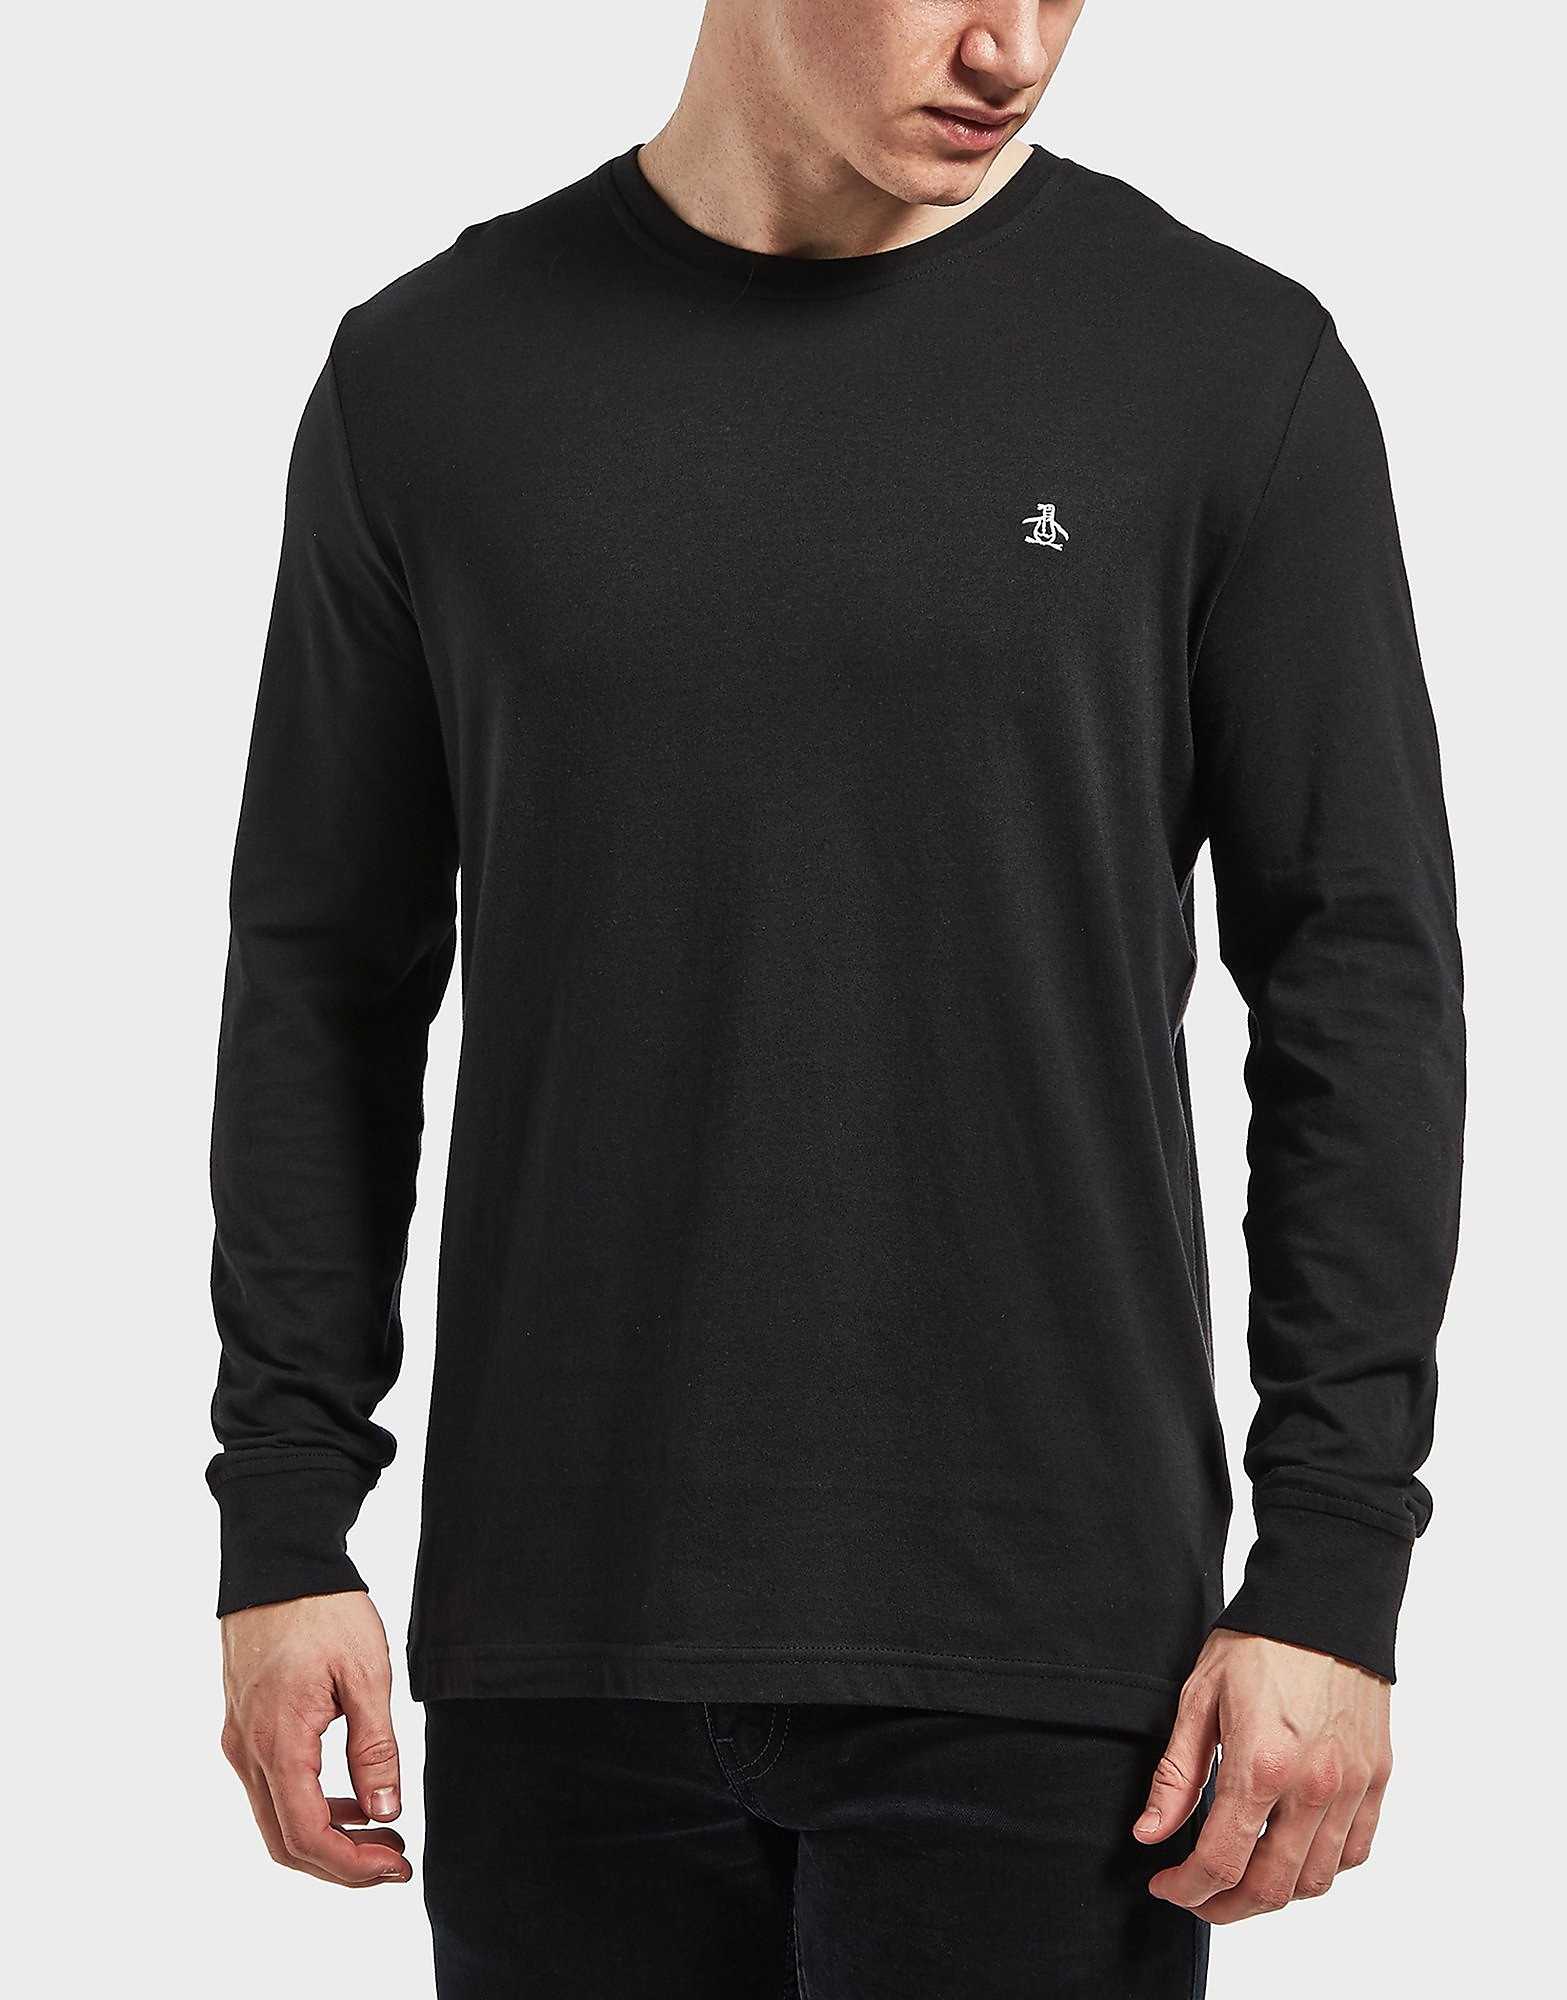 Original Penguin Long Sleeve T-Shirt - Exclusive